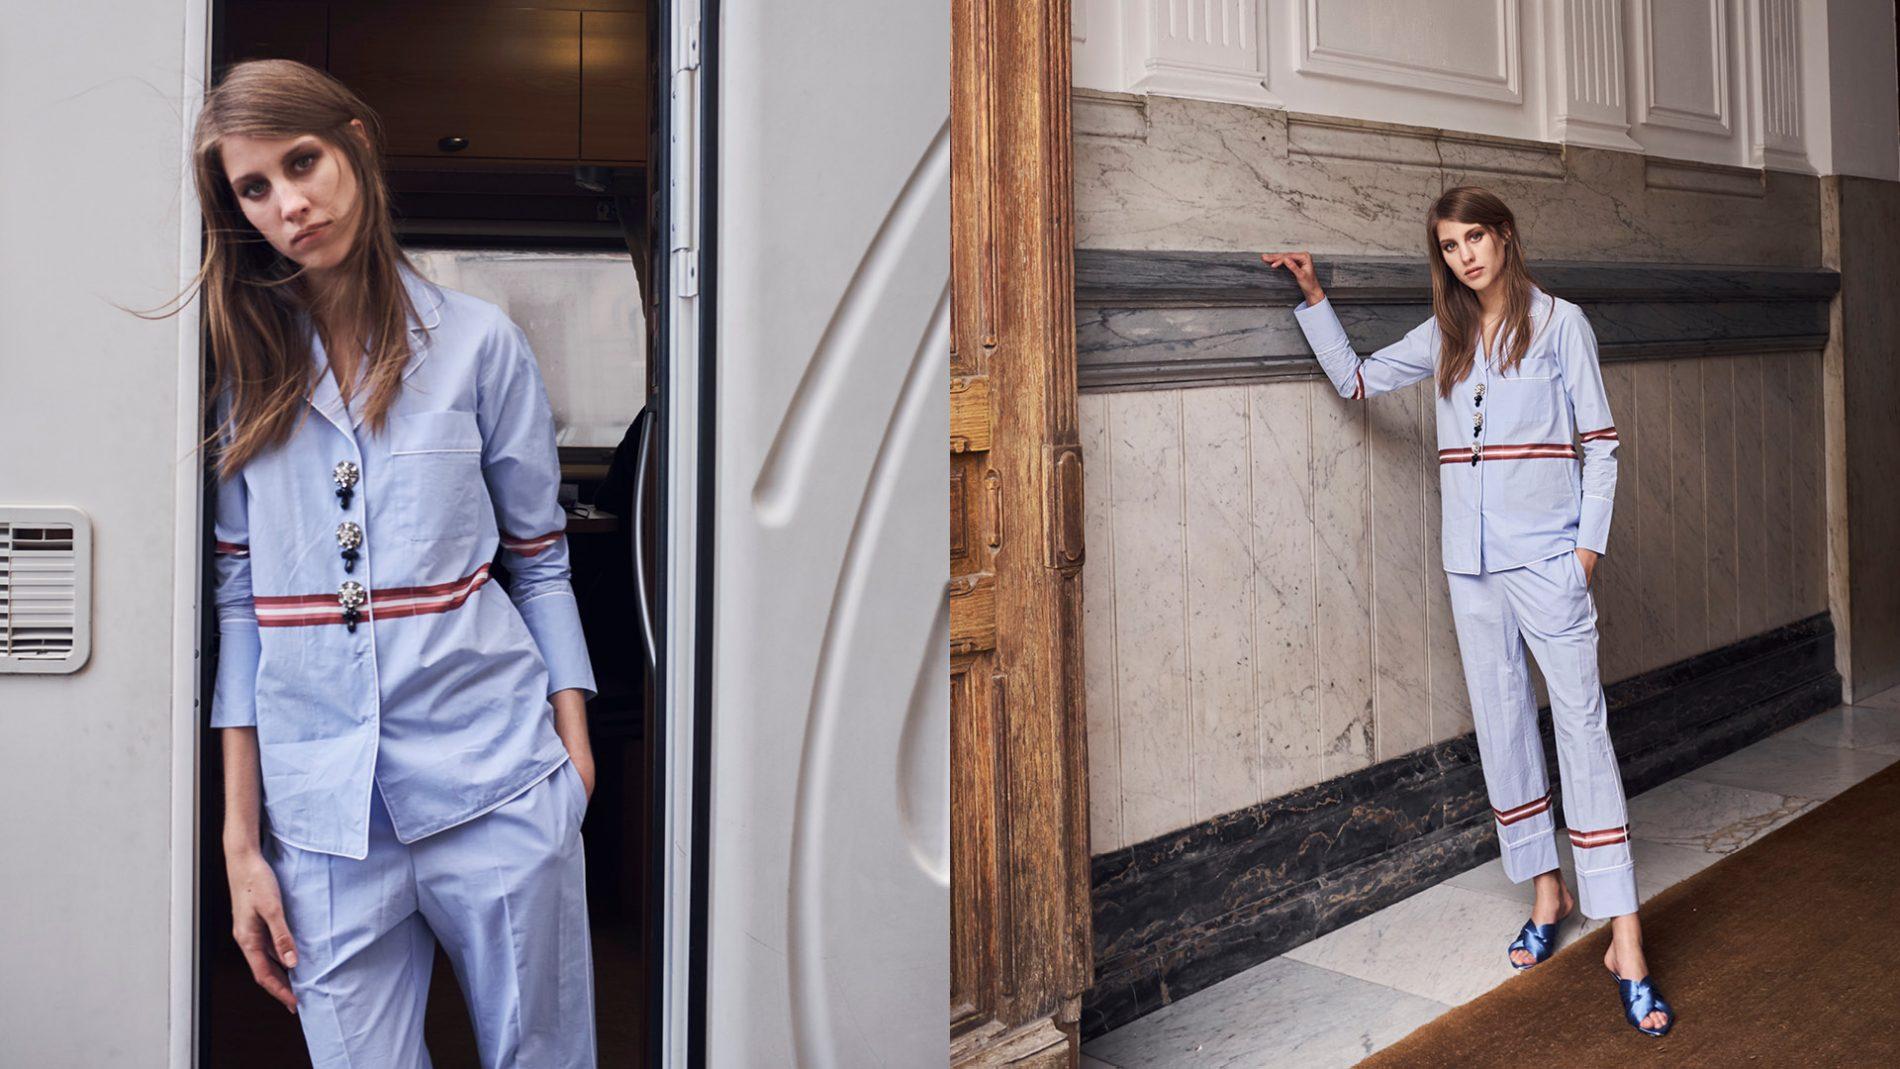 El Corte Inglés Ready-To-Wear N21 Blue Pajama Set, Shoes